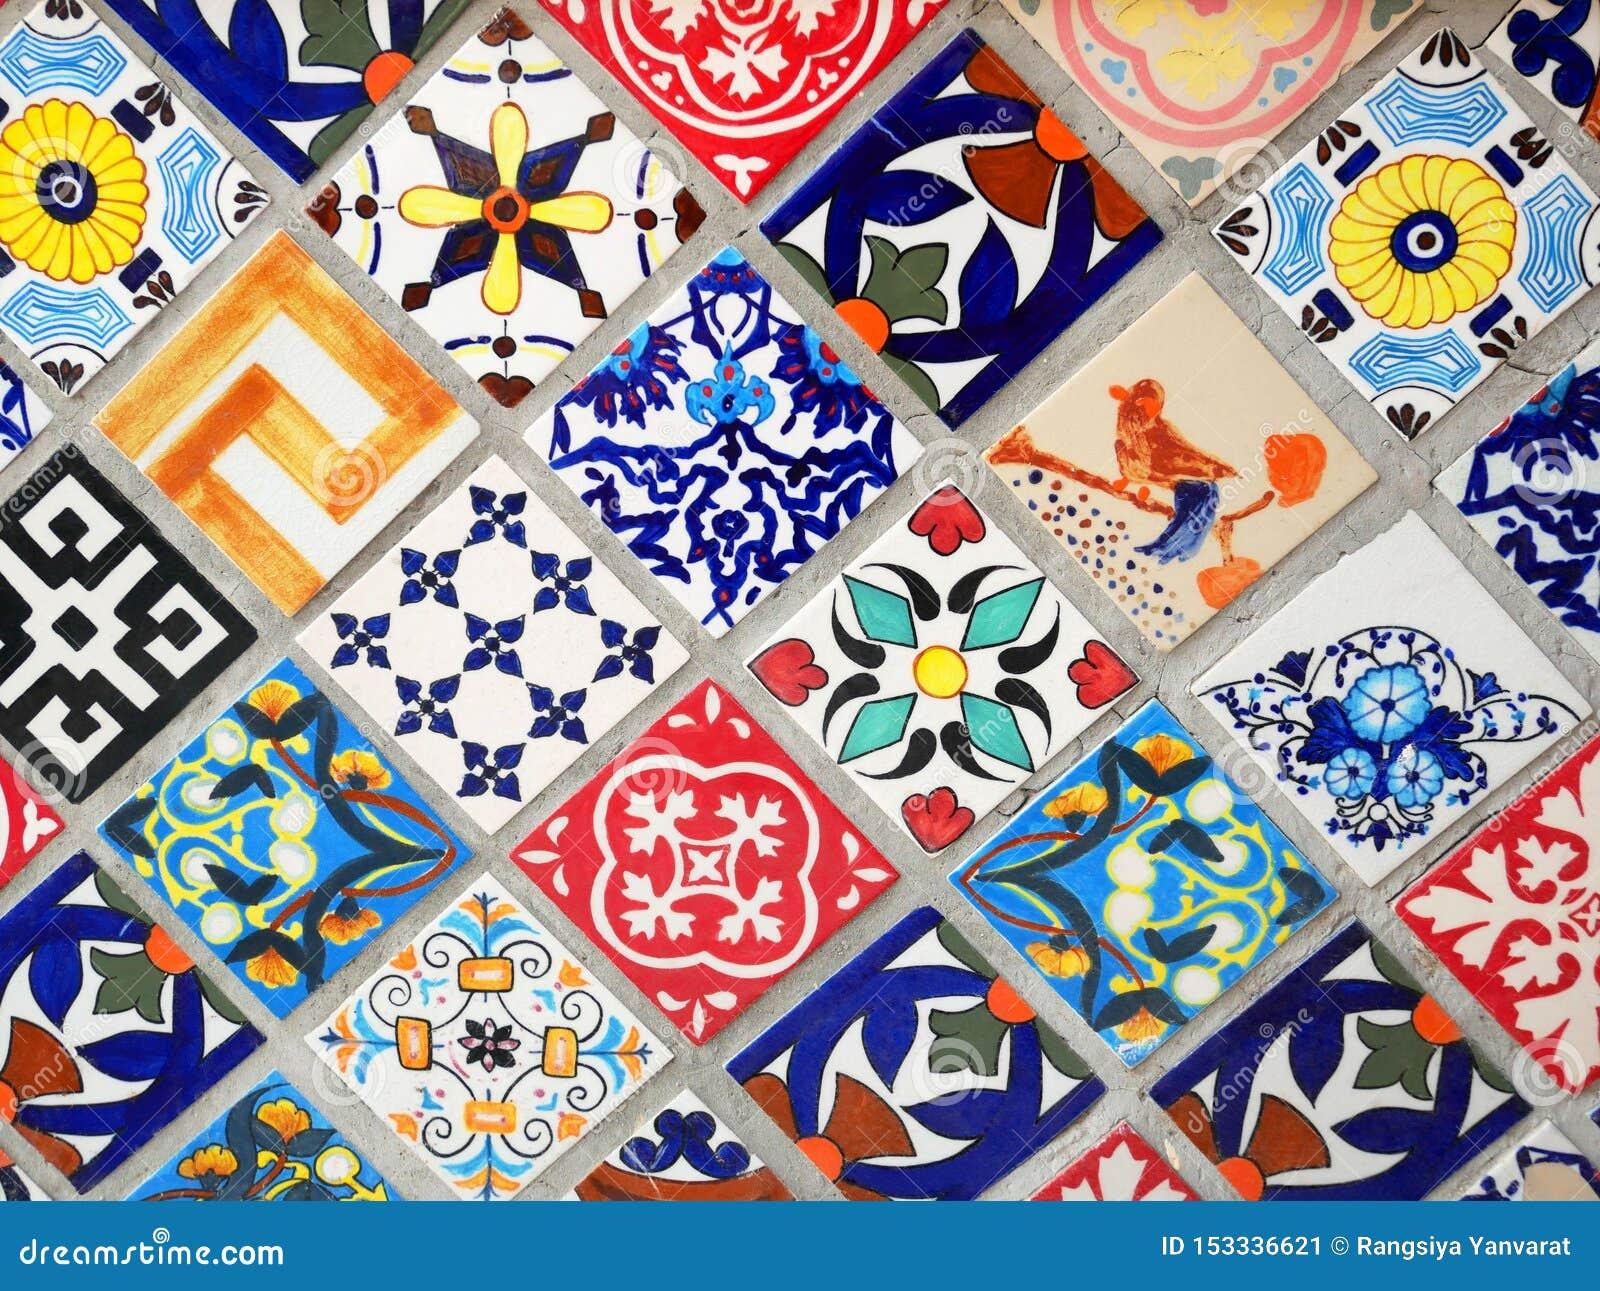 Colorful Vintage Ceramic Tiles Wall Decoration Stock Image Image Of Decorative Frame 153336621